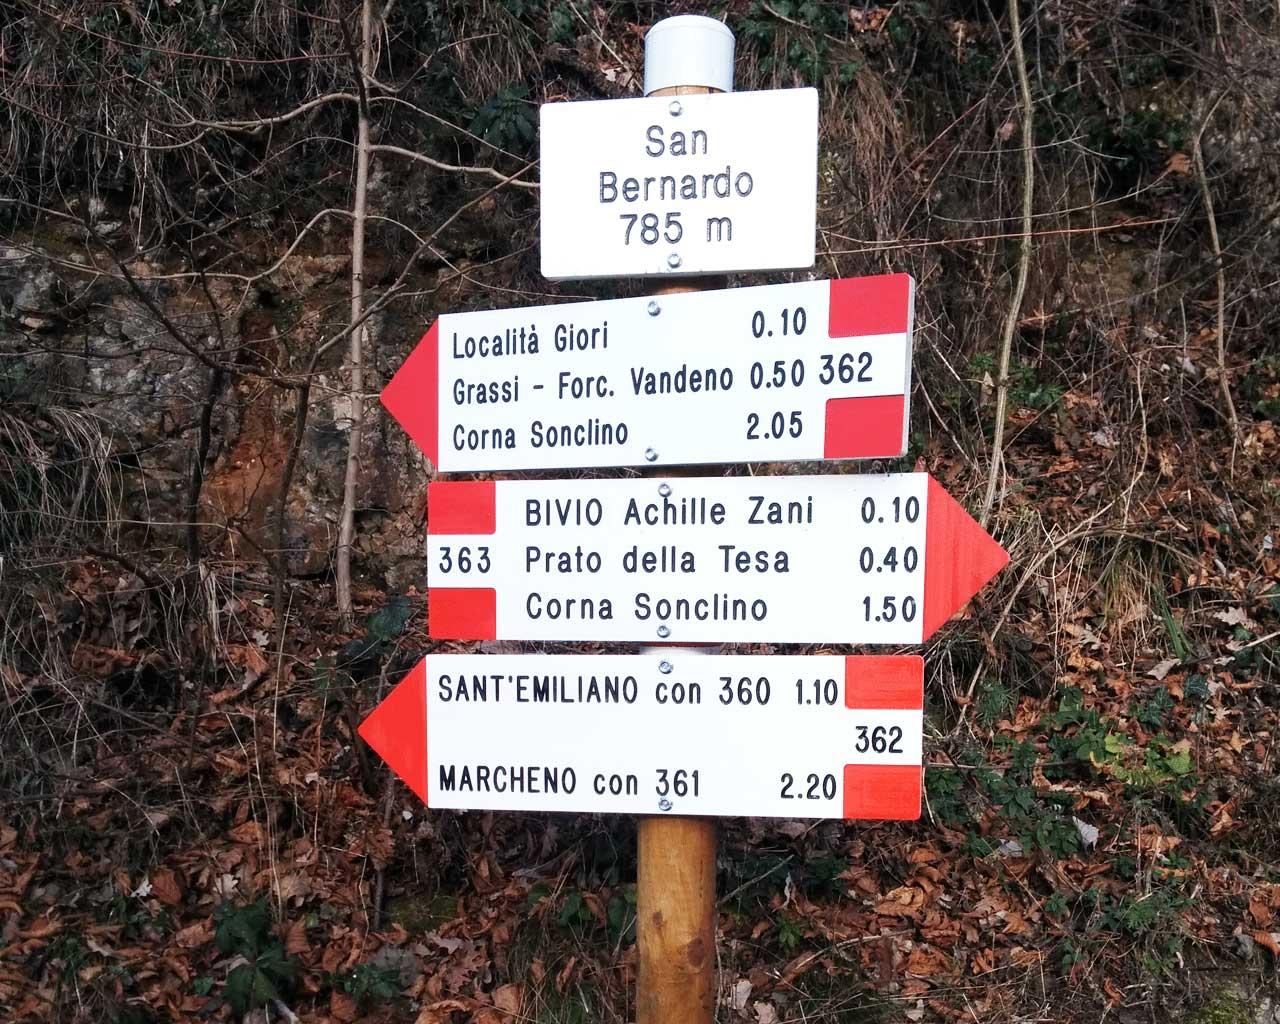 I segnavia Cai in località San Bernardo